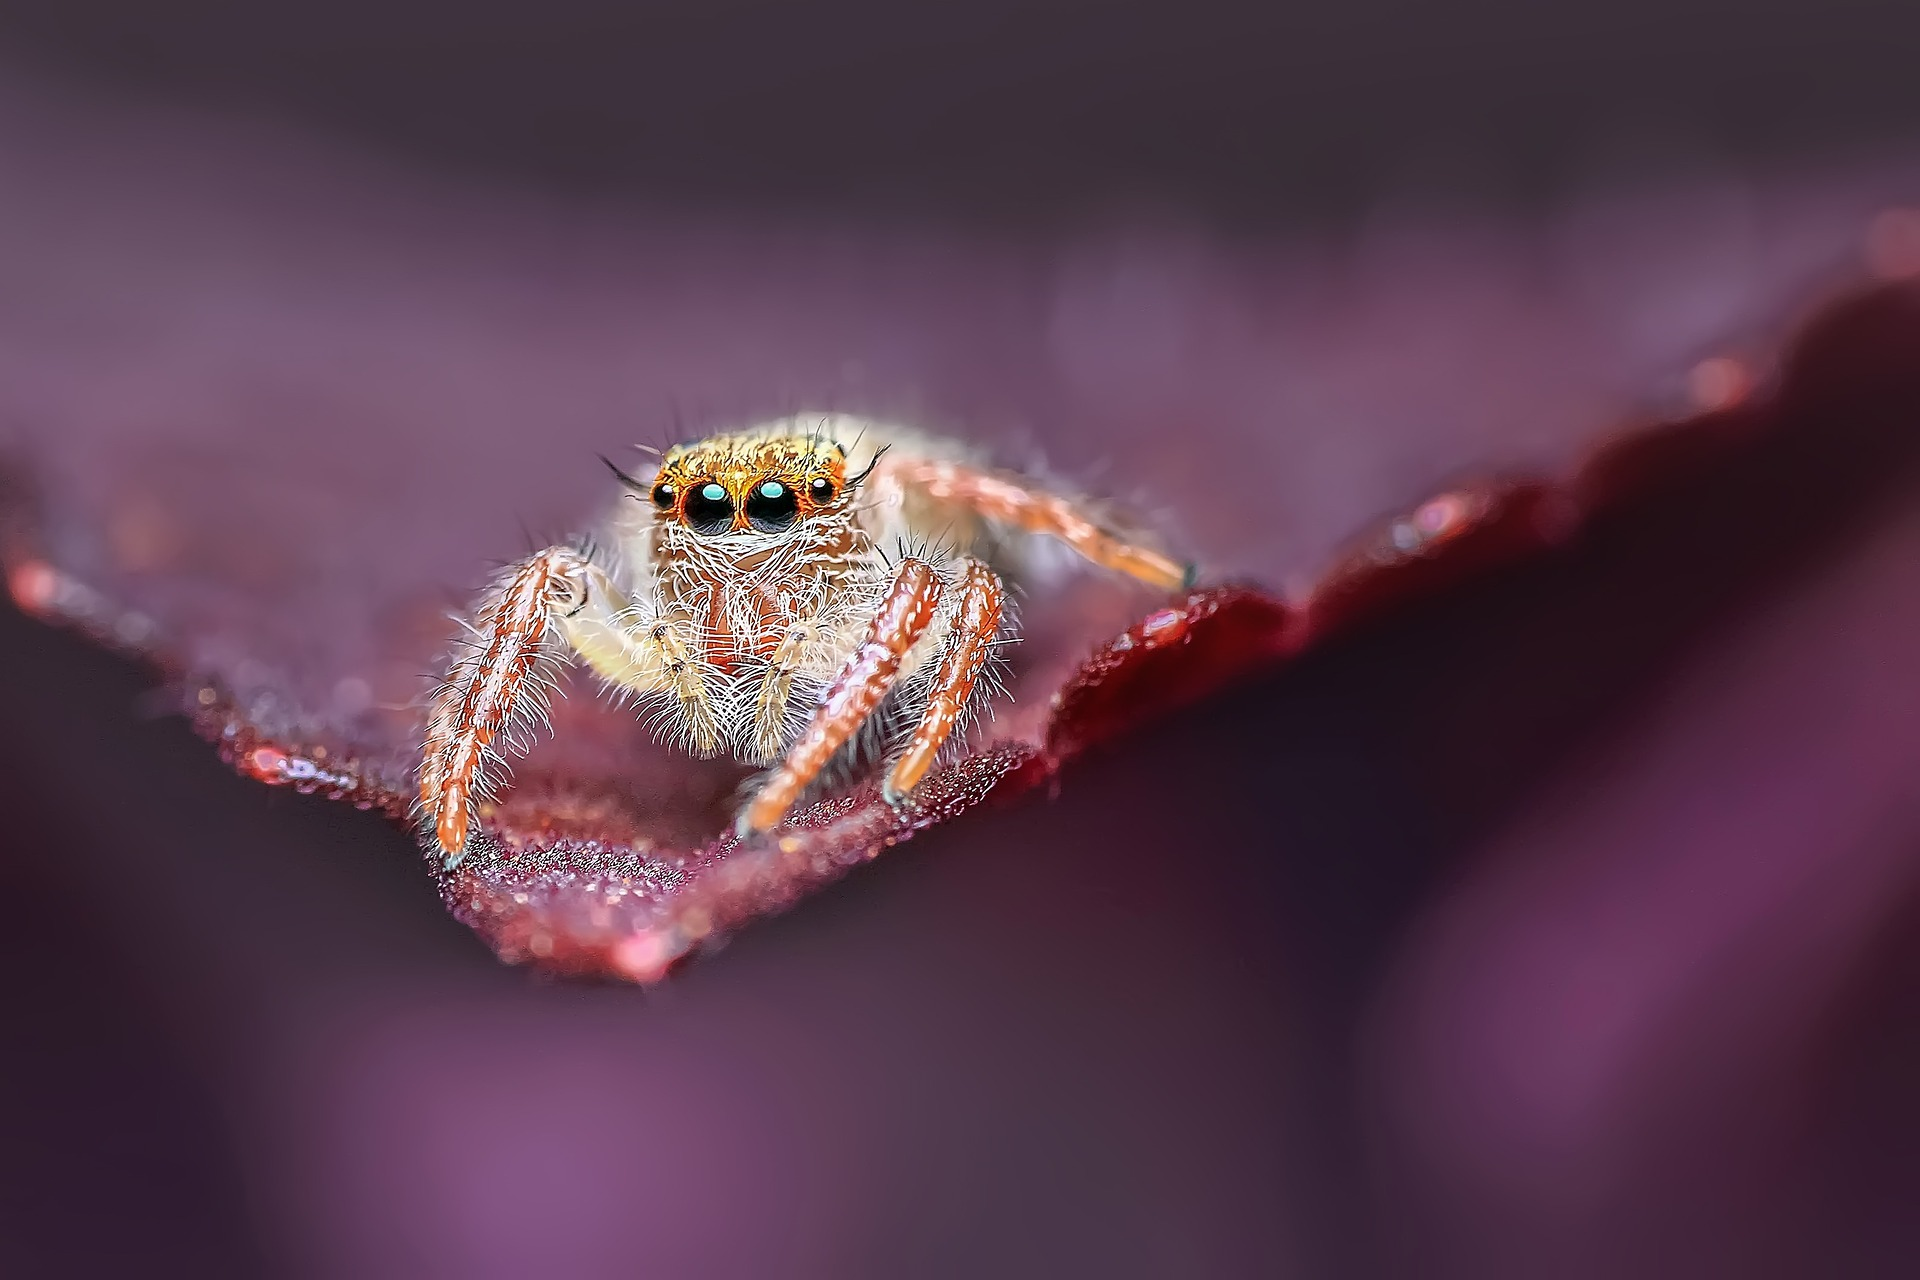 jumping-spider-1130504_1920